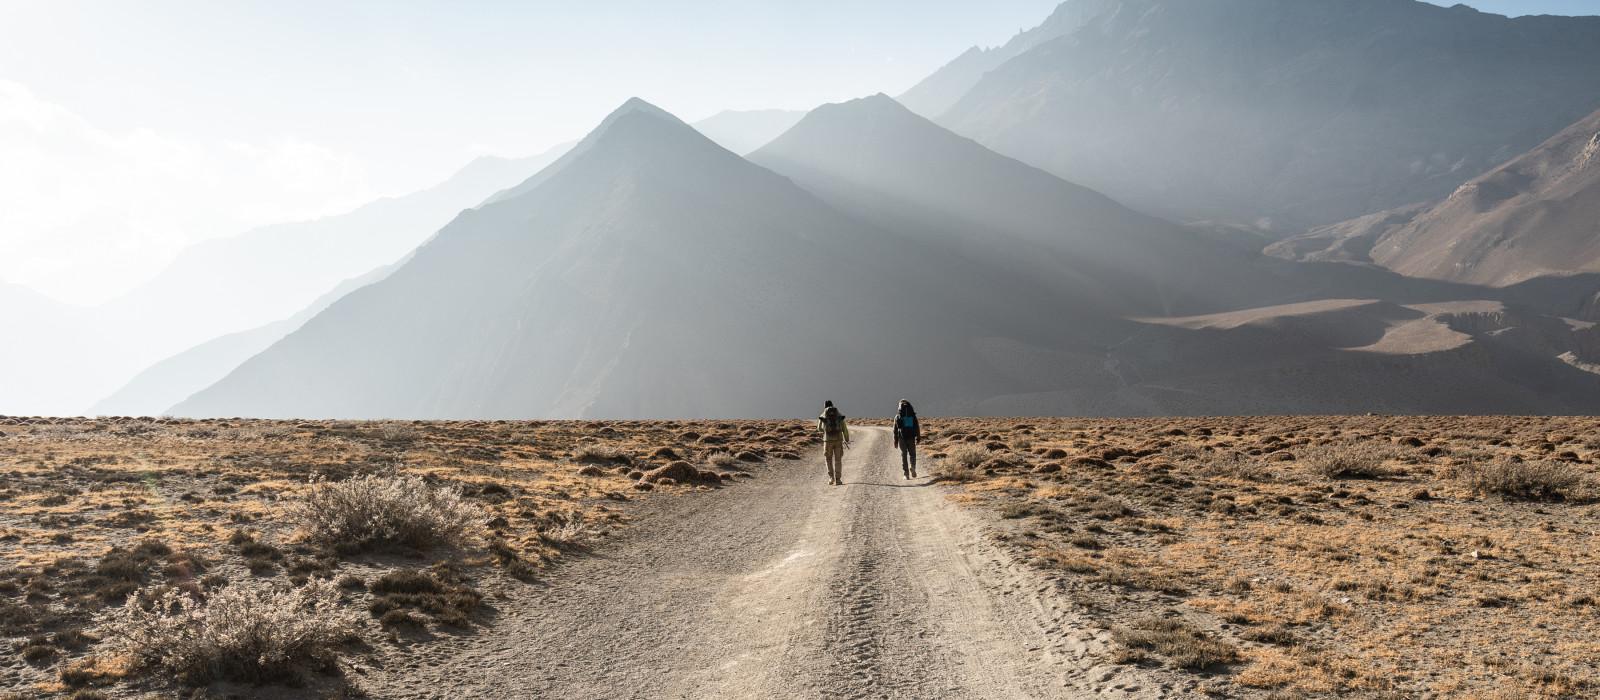 Nepal-Gebirge Himalaya Trekking Annapurna Sanctuary, Asien